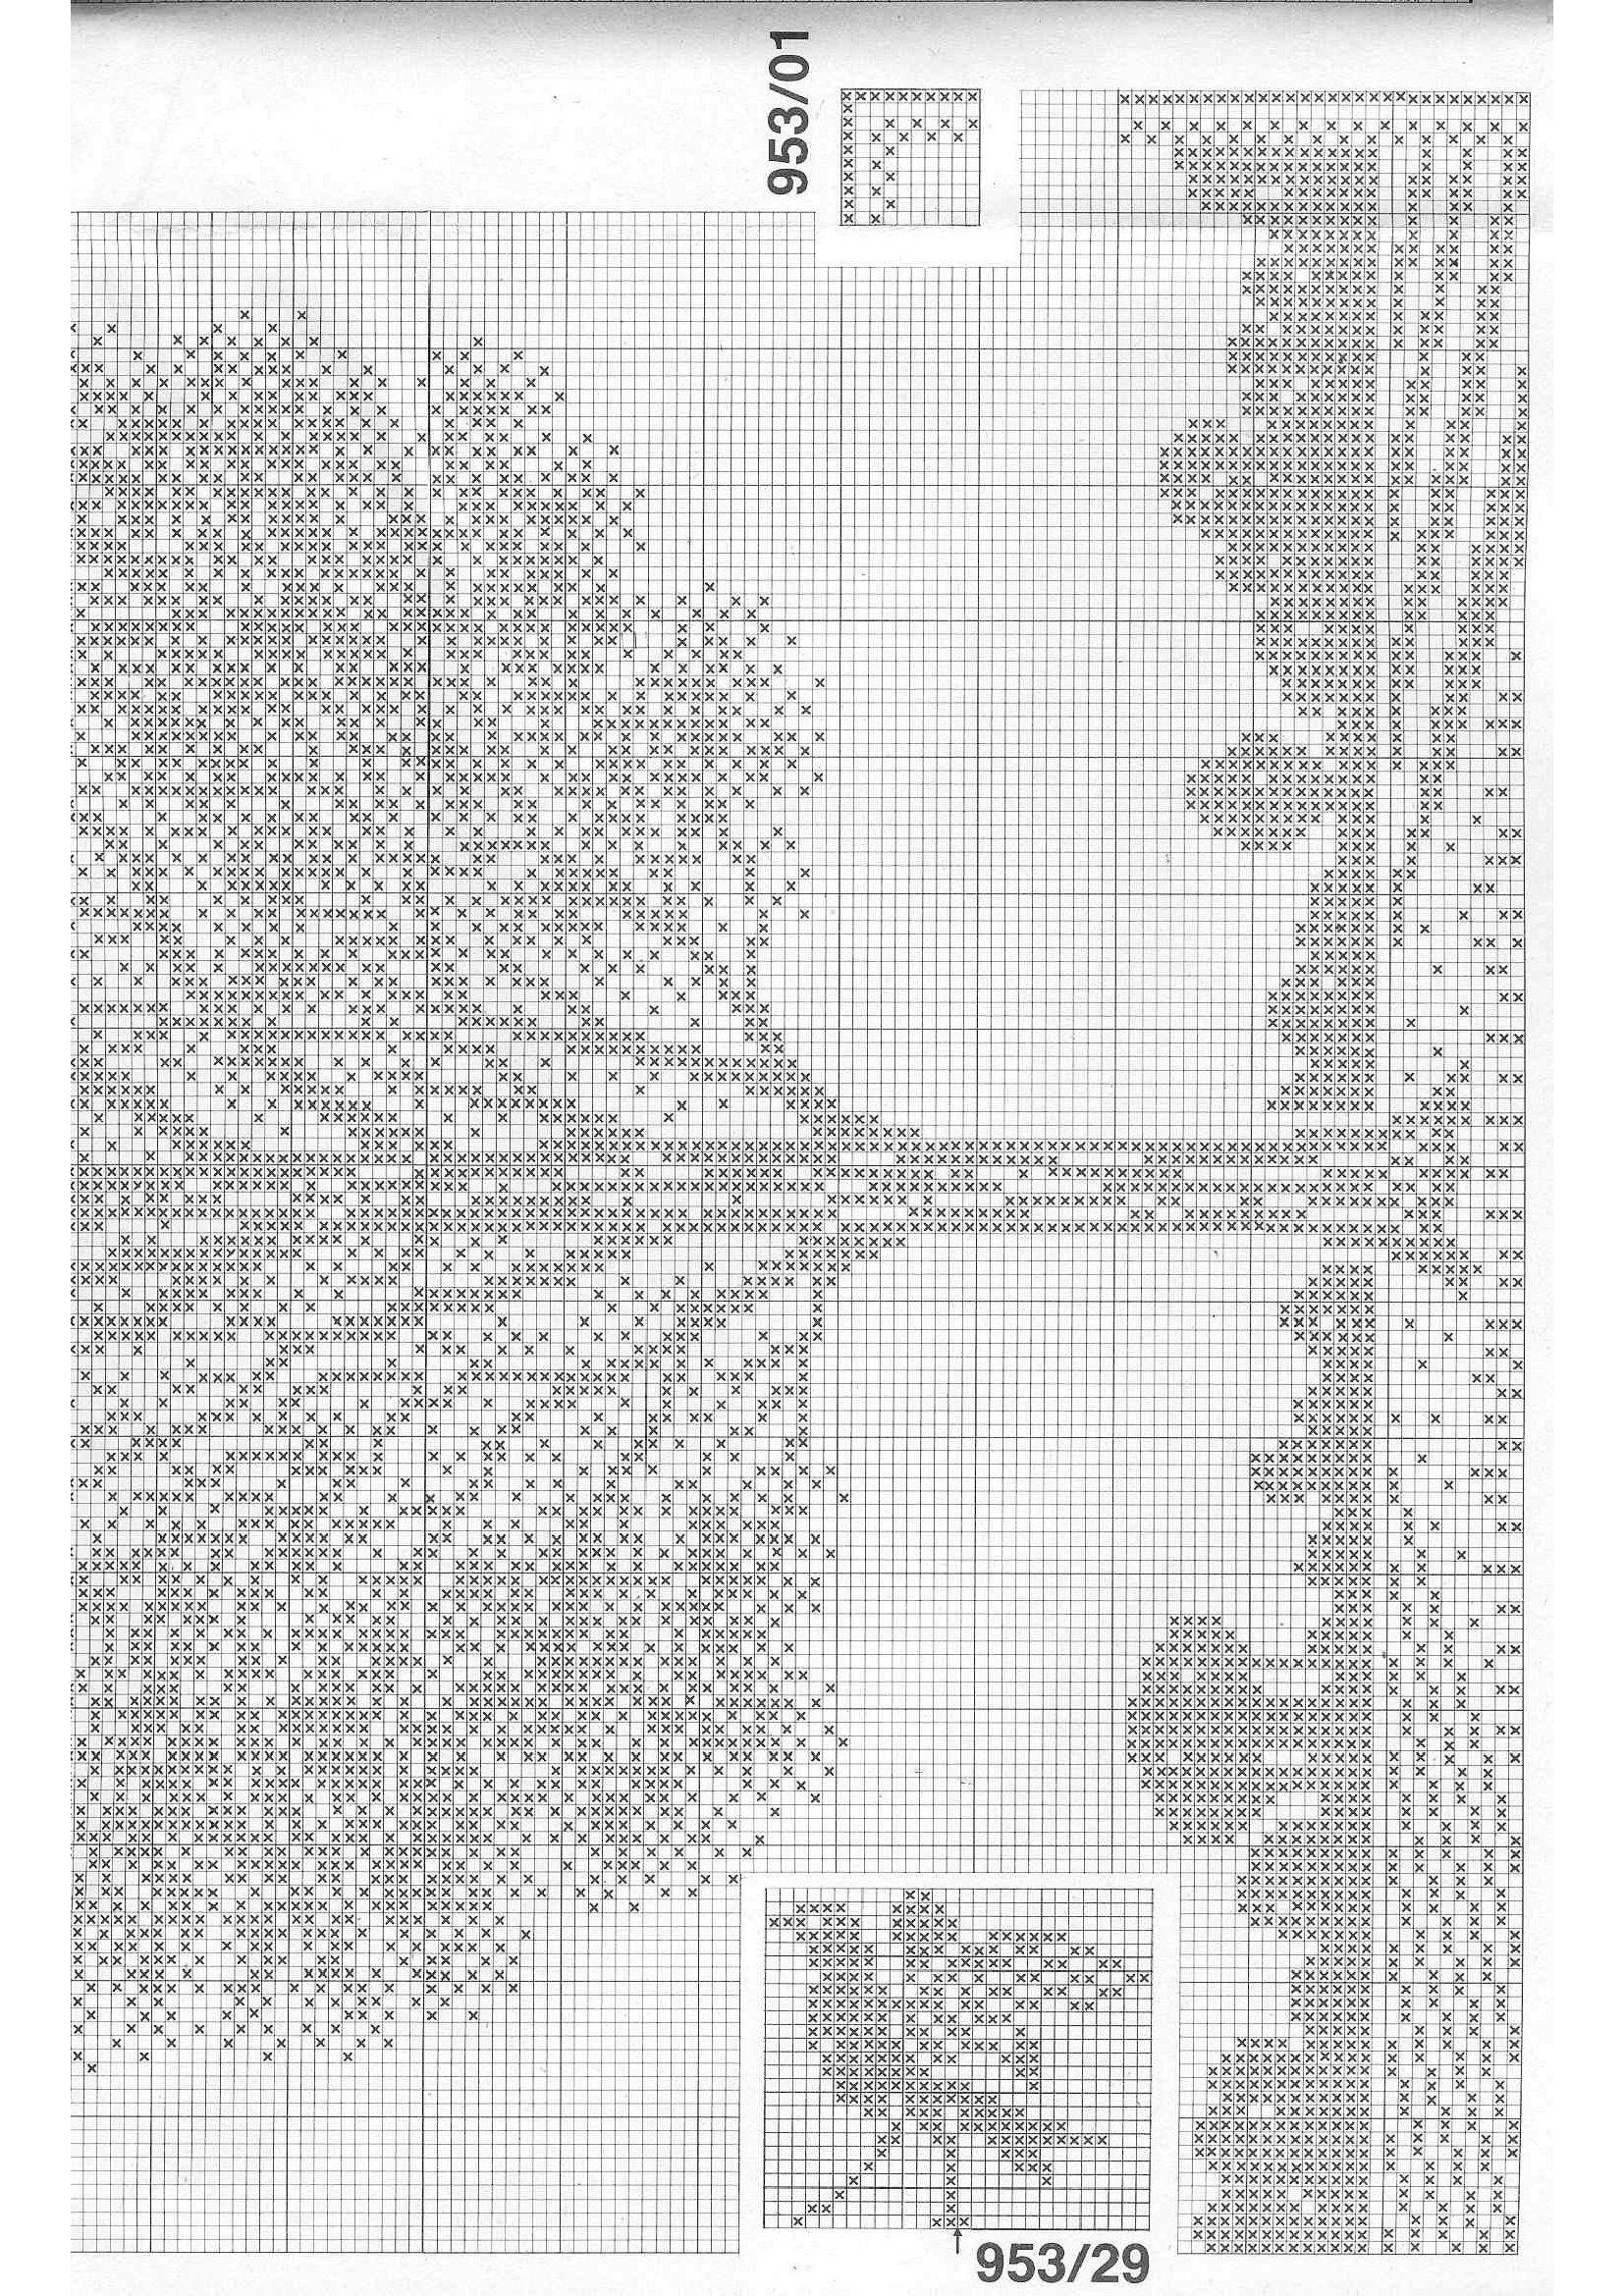 o_06164005b722c1da_053.jpg | Projects to Try | Pinterest | Baum ...